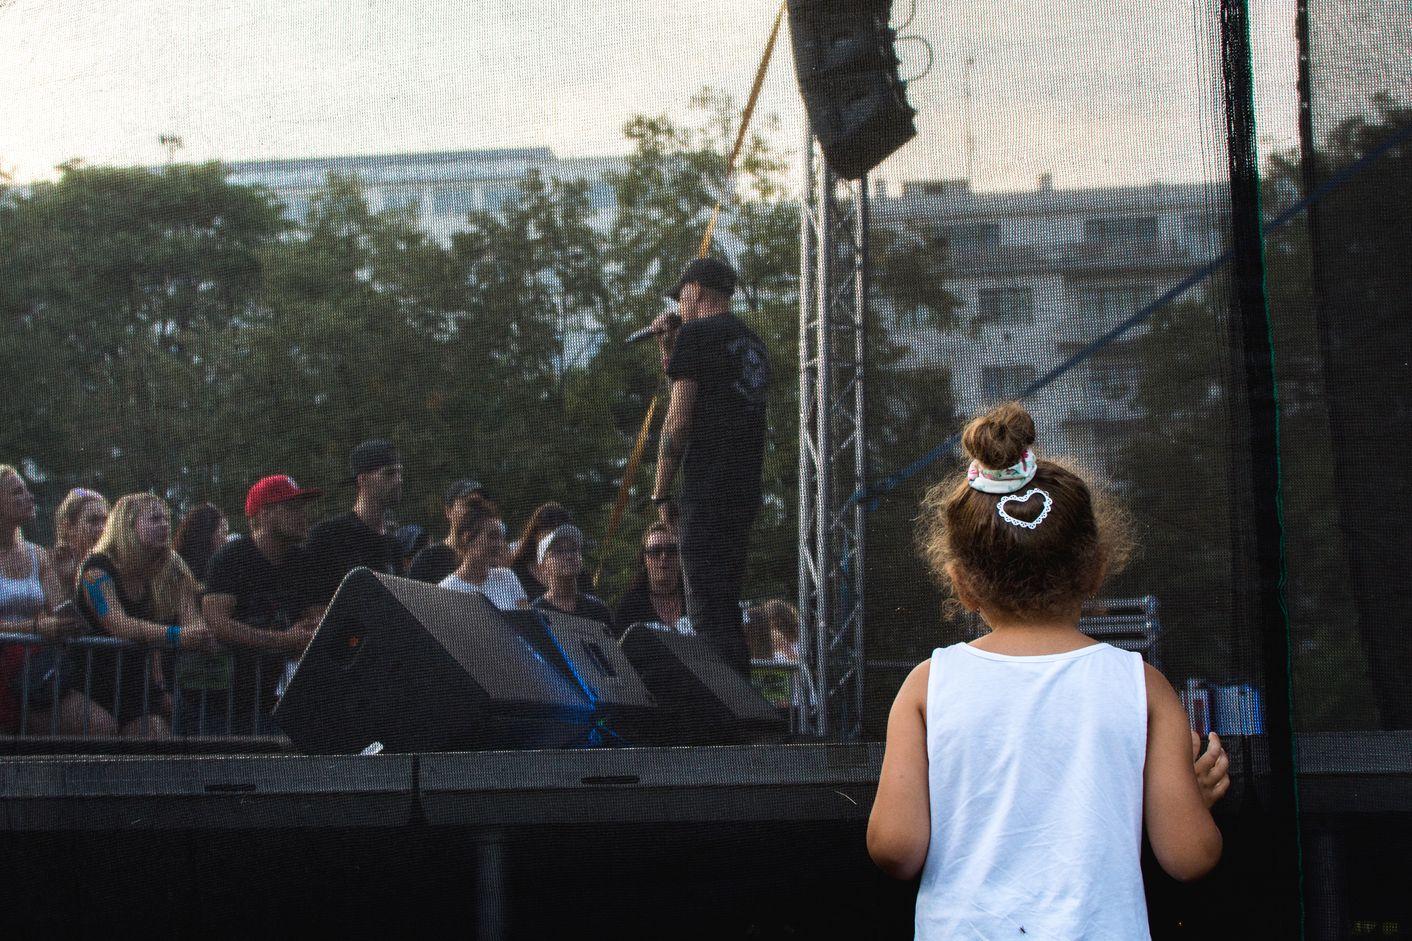 Uprostred-hiphop-srpen-Krezek-Jaroslav-29-.JPG